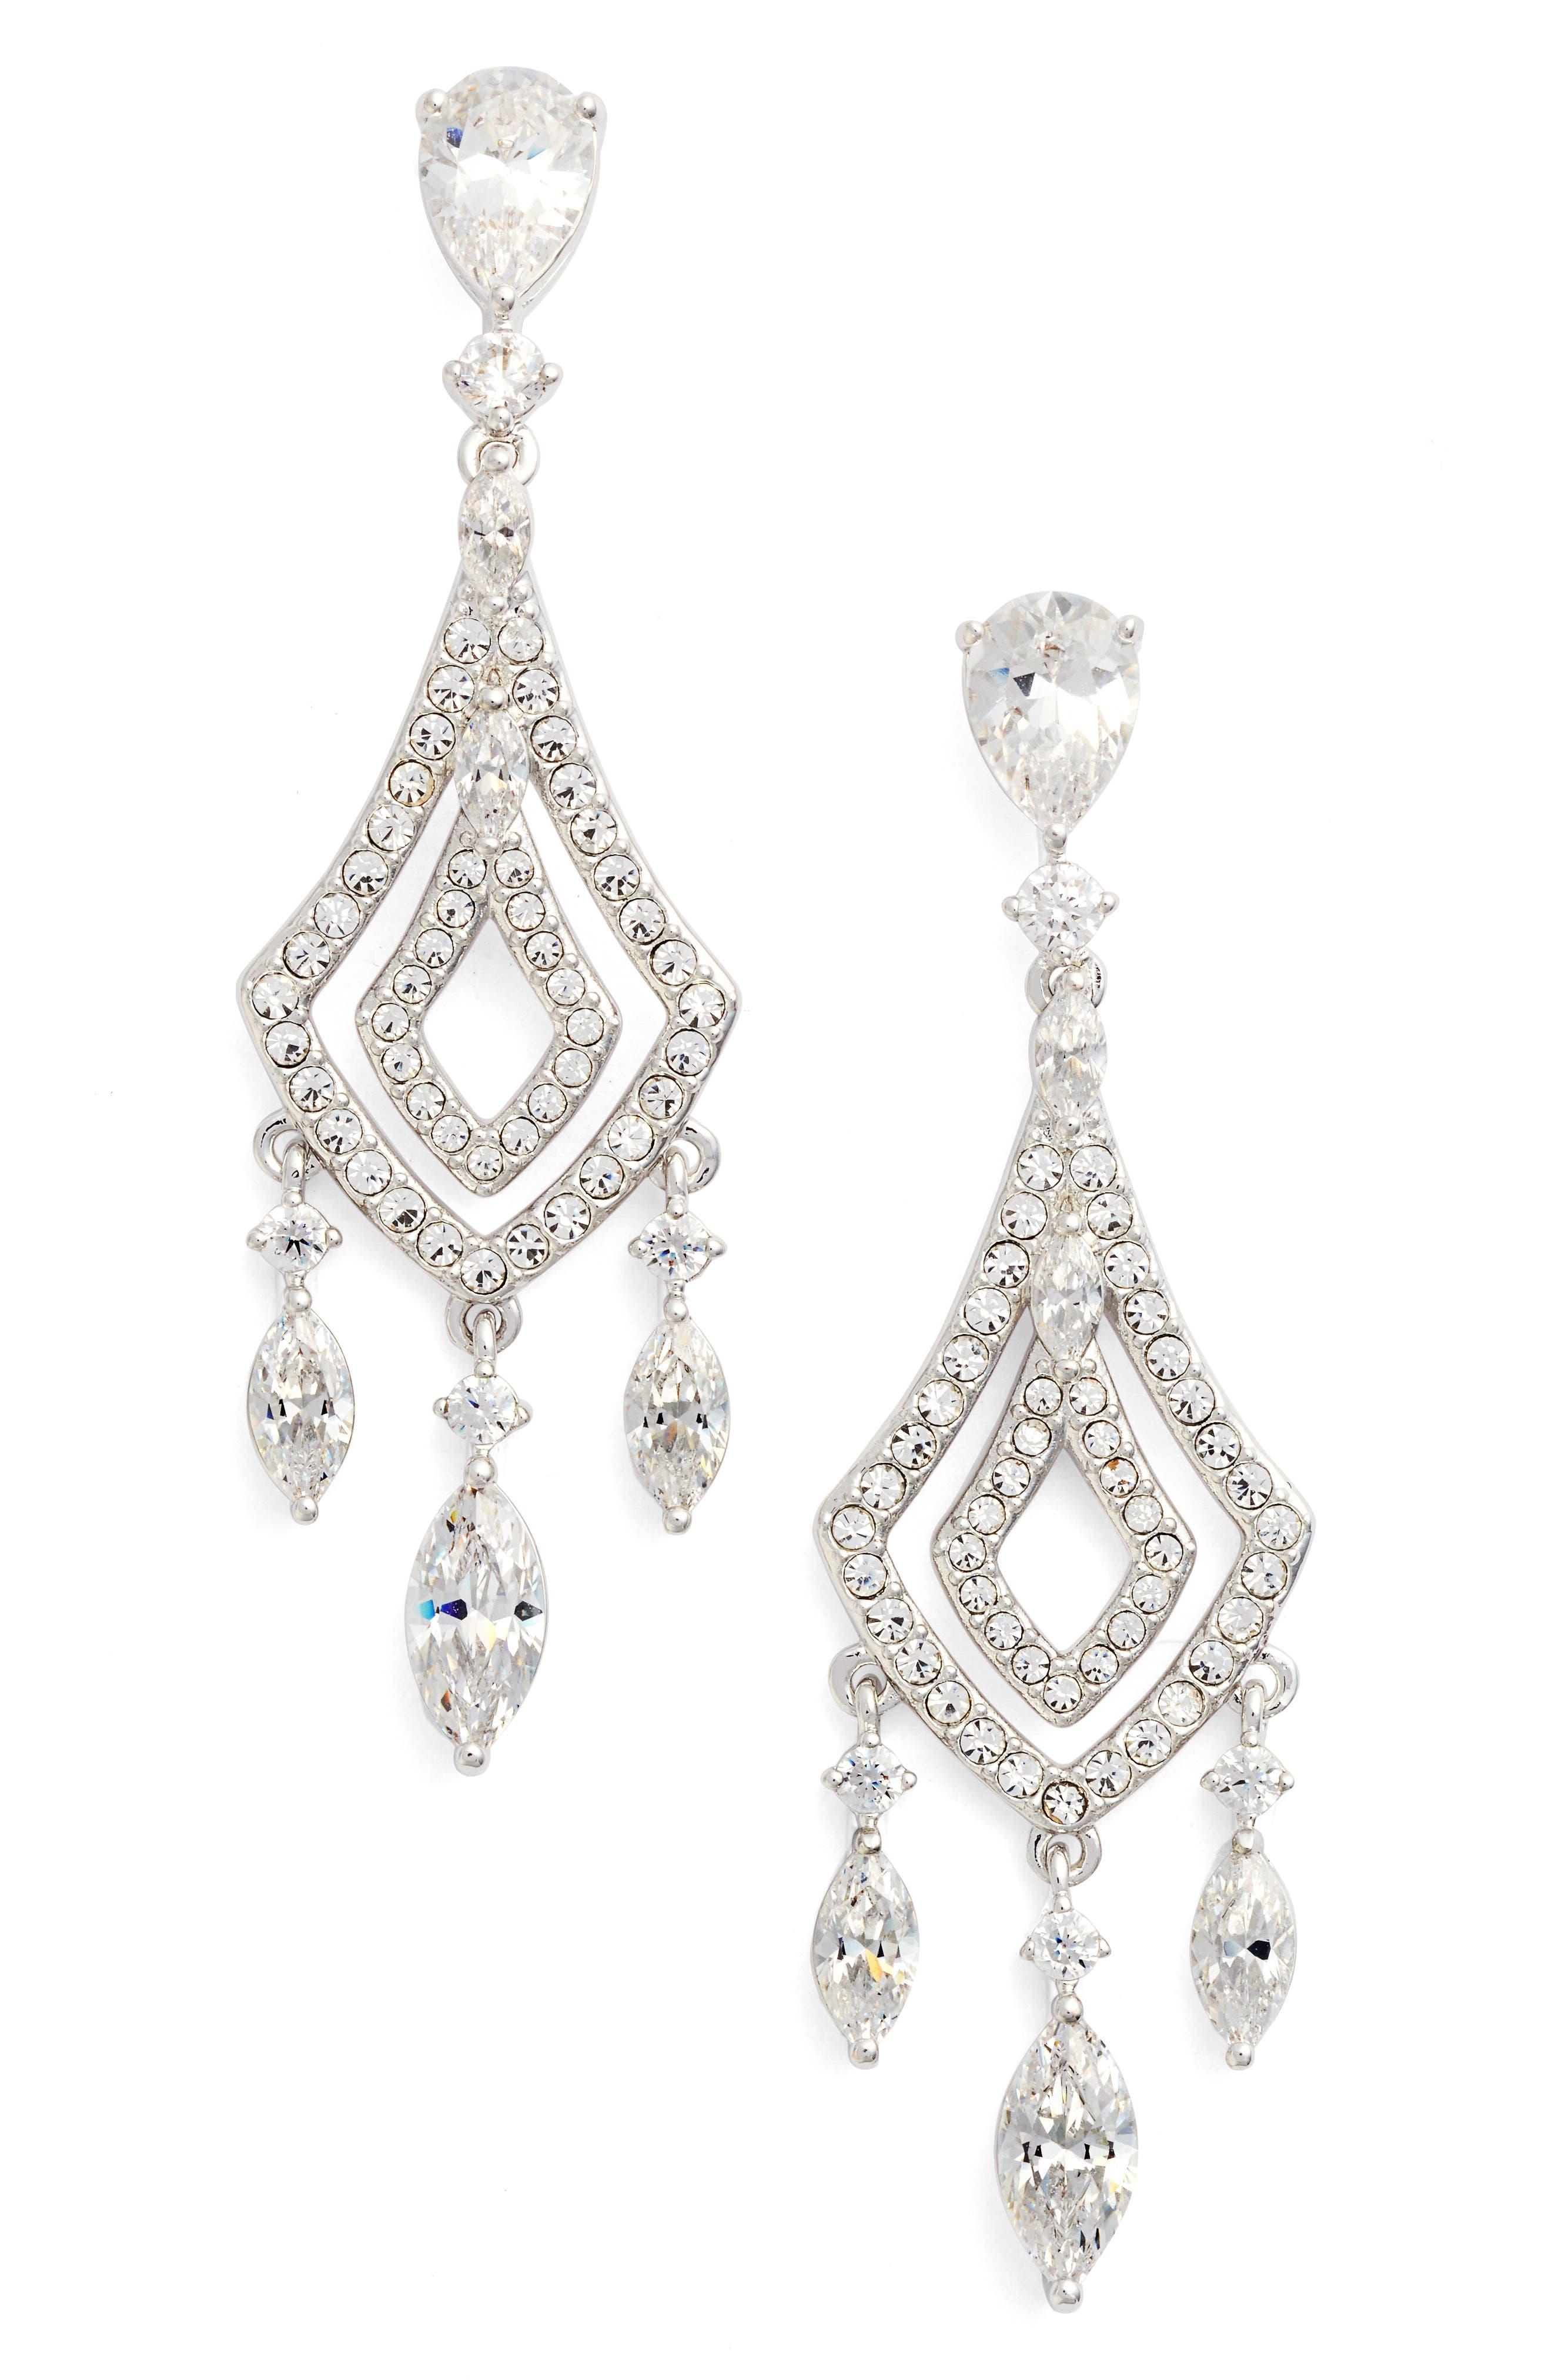 Main Image - Nadri Cubic Zirconia Chandelier Earrings